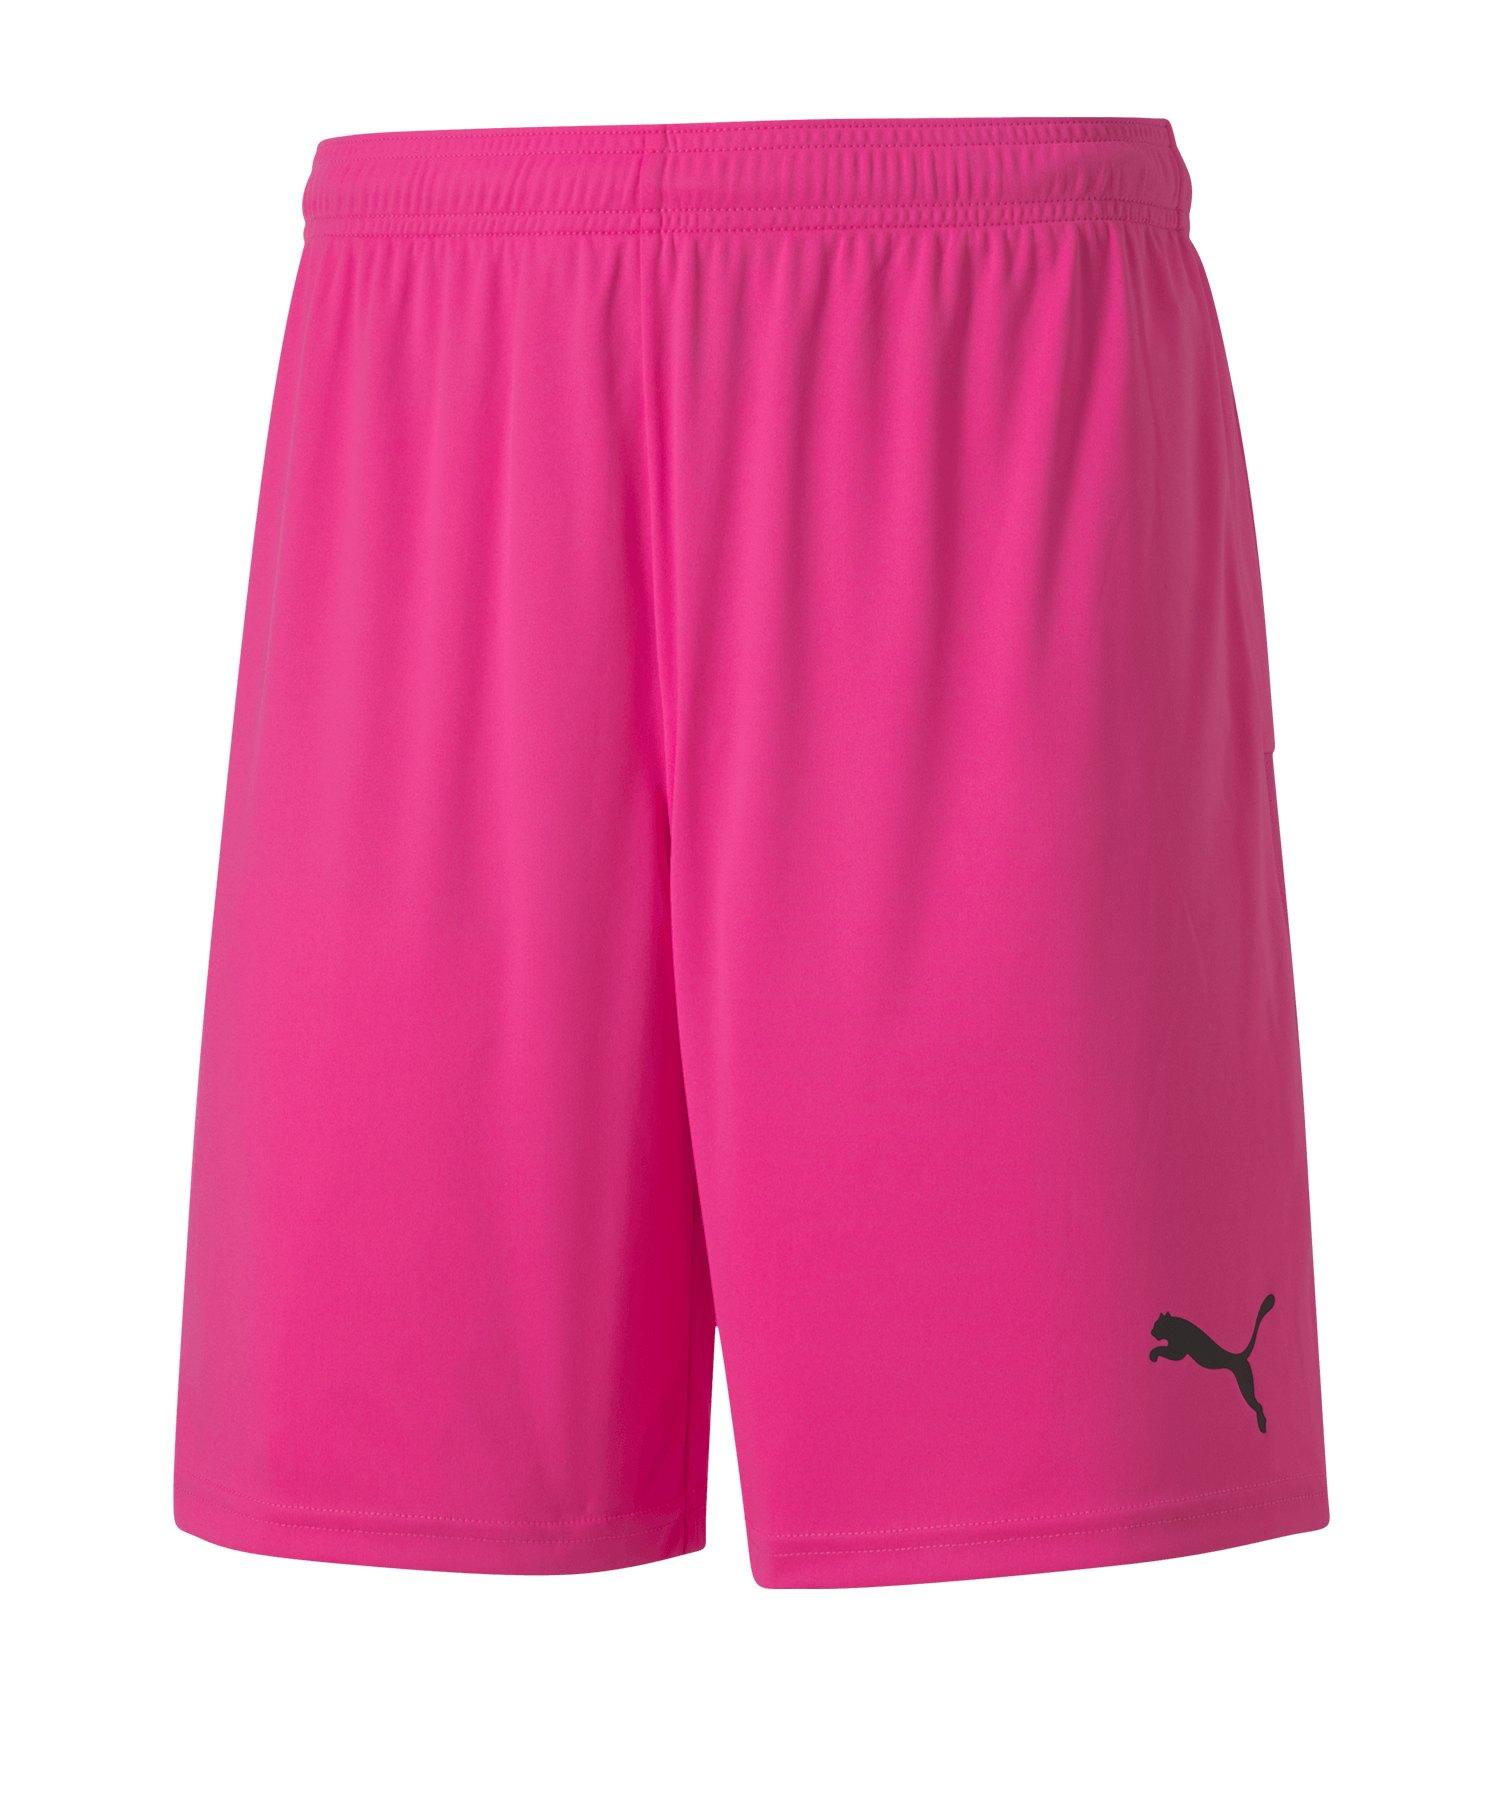 PUMA teamGOAL 23 Knit Short Pink F25 - pink